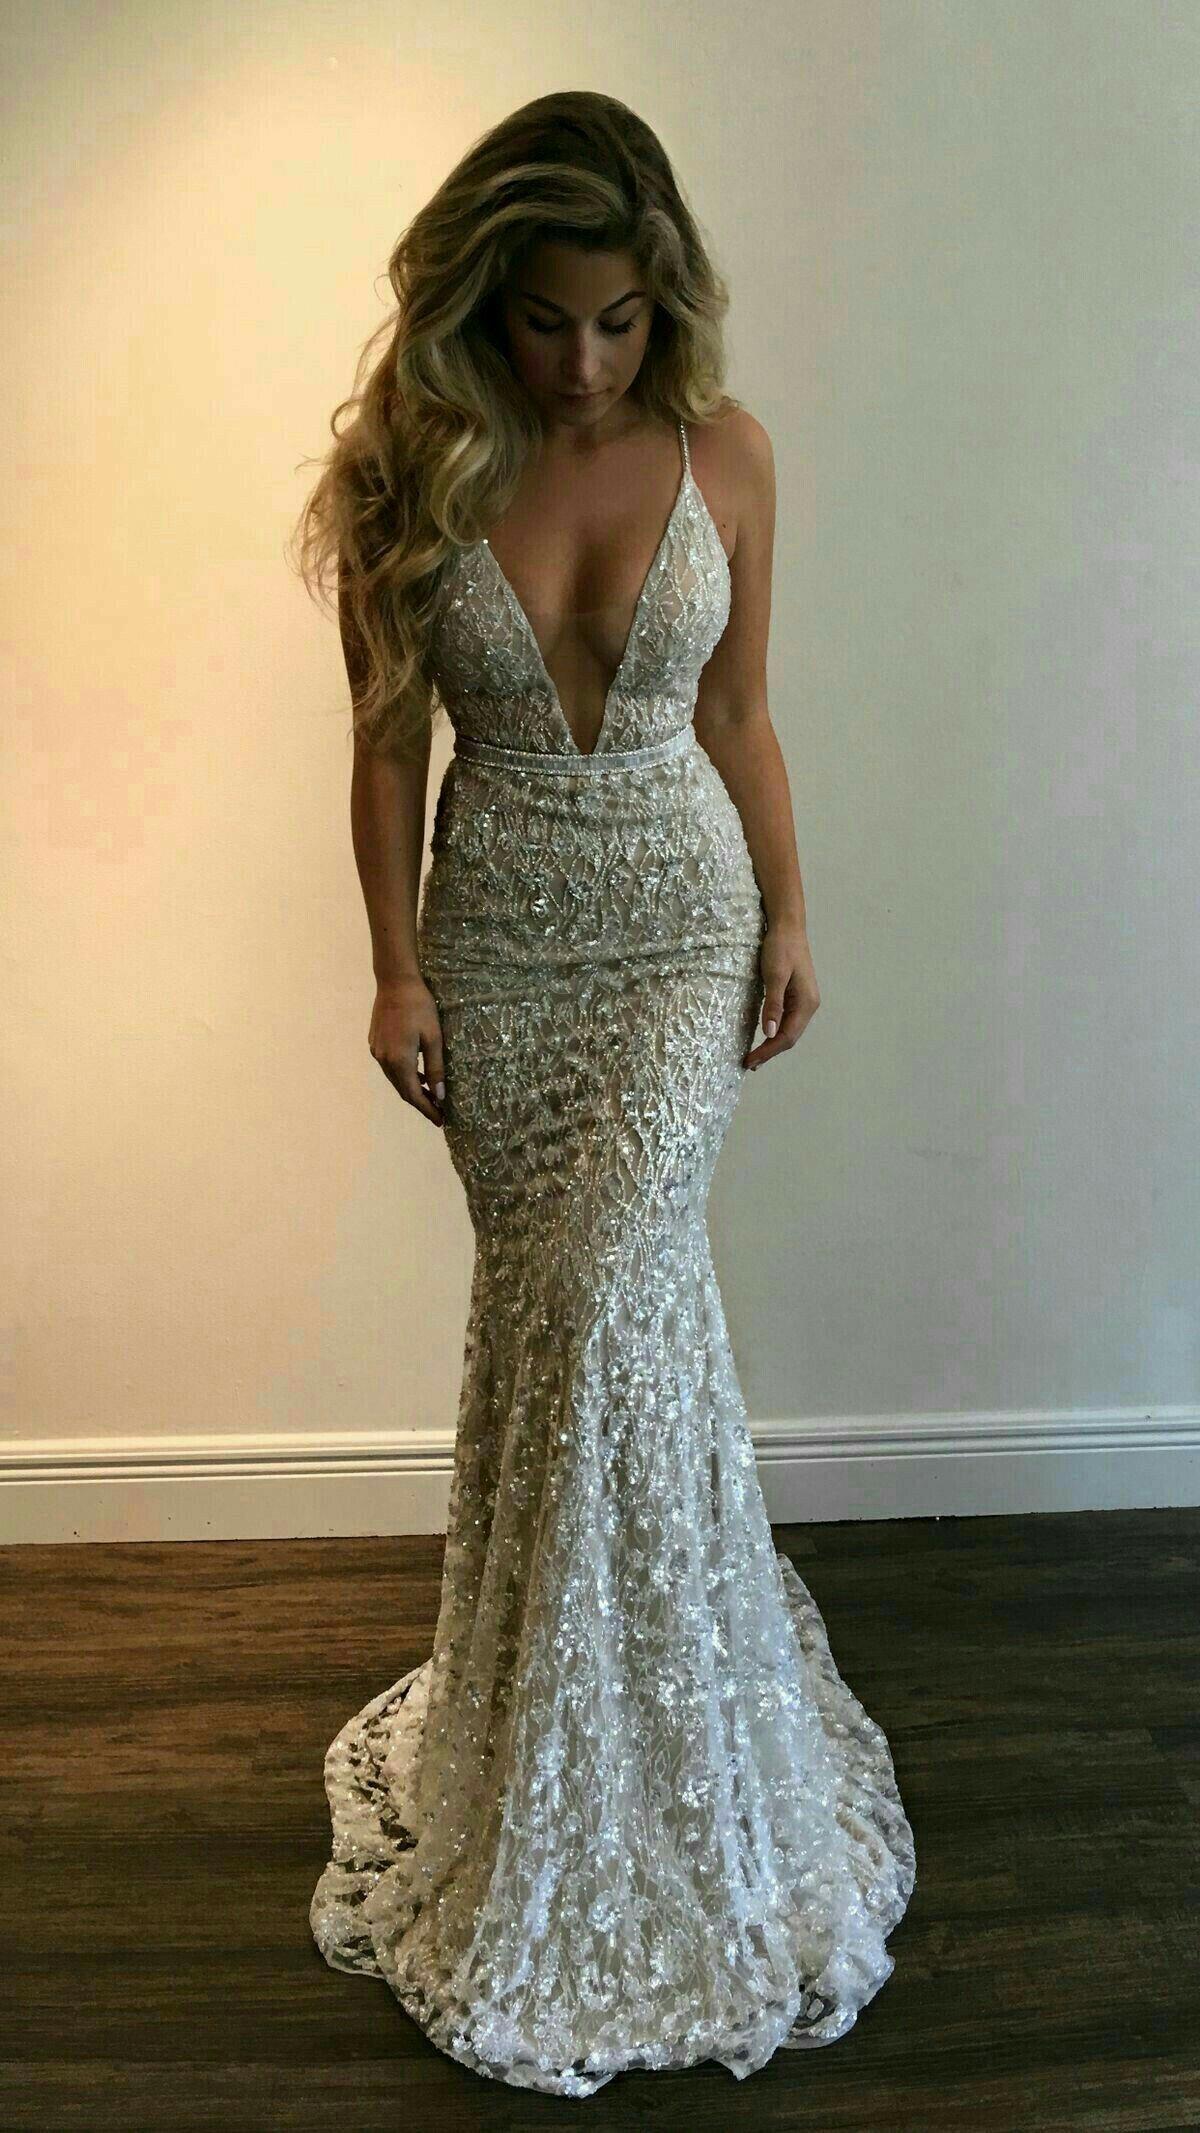 Pin by nisreen malik on fashion u beauty pinterest dresses prom